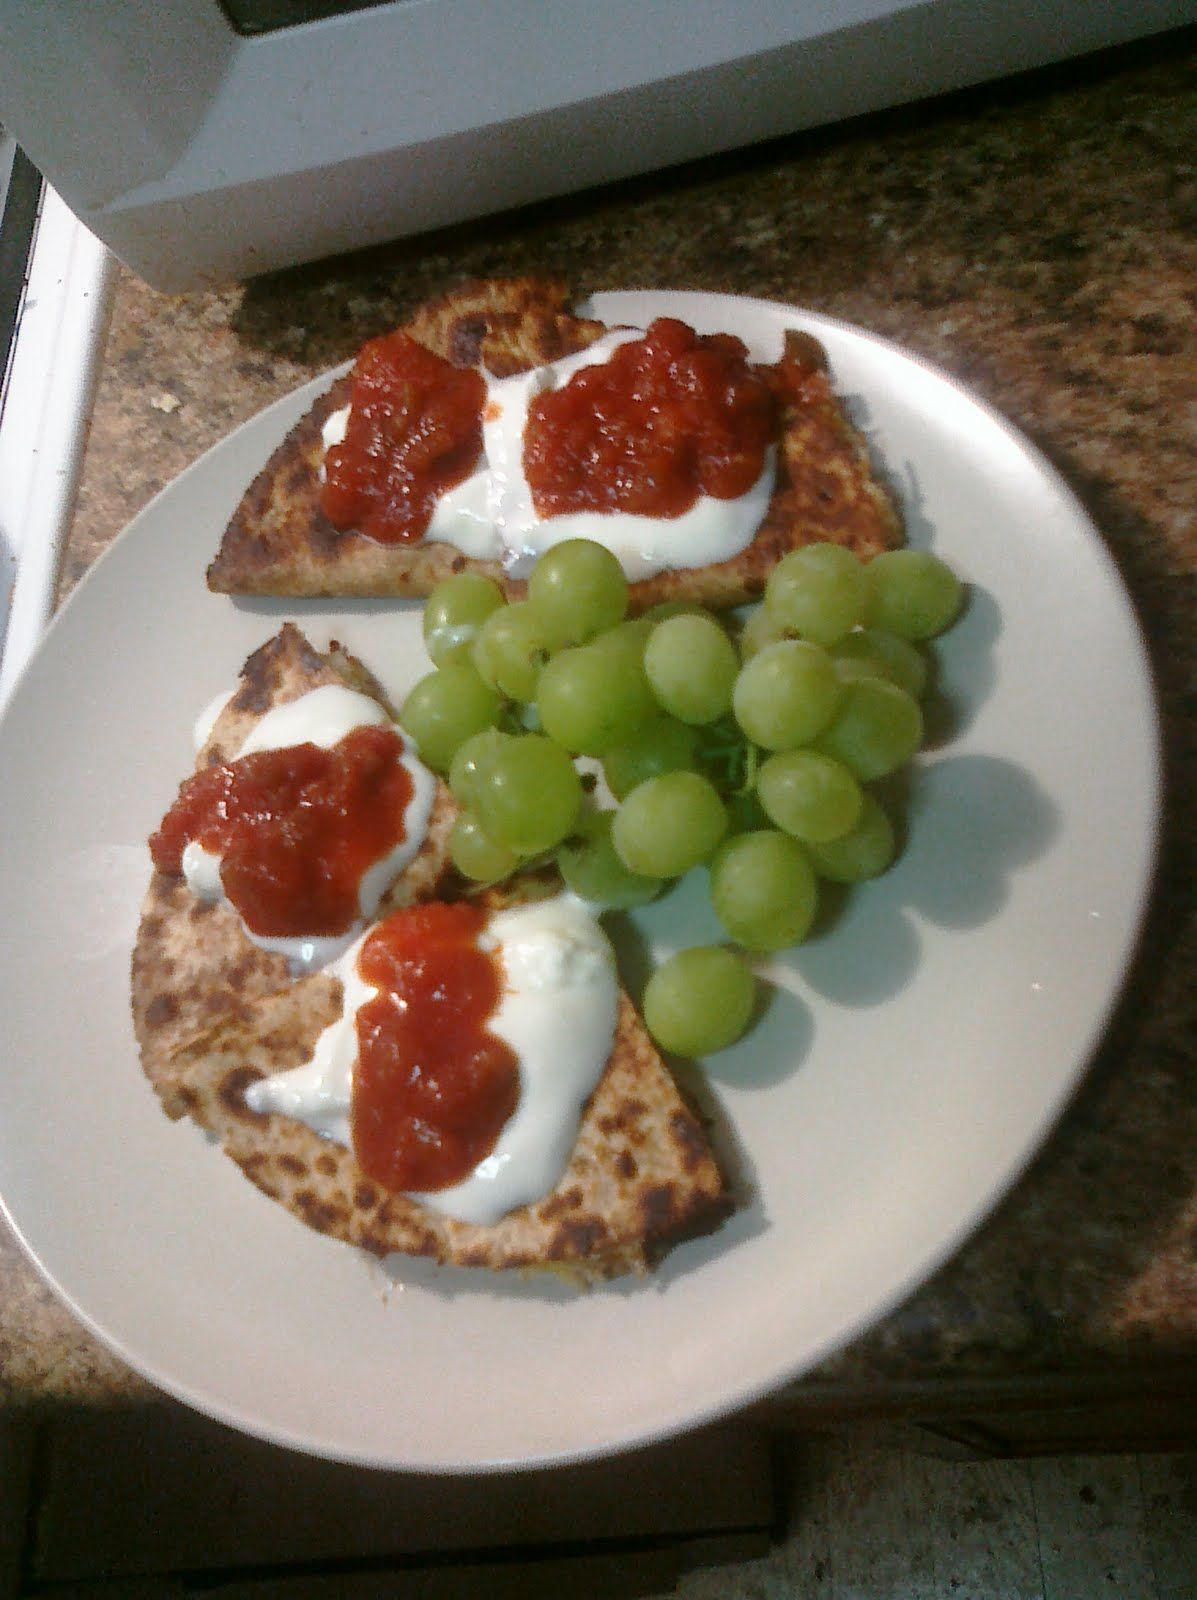 Bariatric Foodie: WLS-friendly Quesadillas | Bariatric Surgery Recipes & Things | Bariatric ...